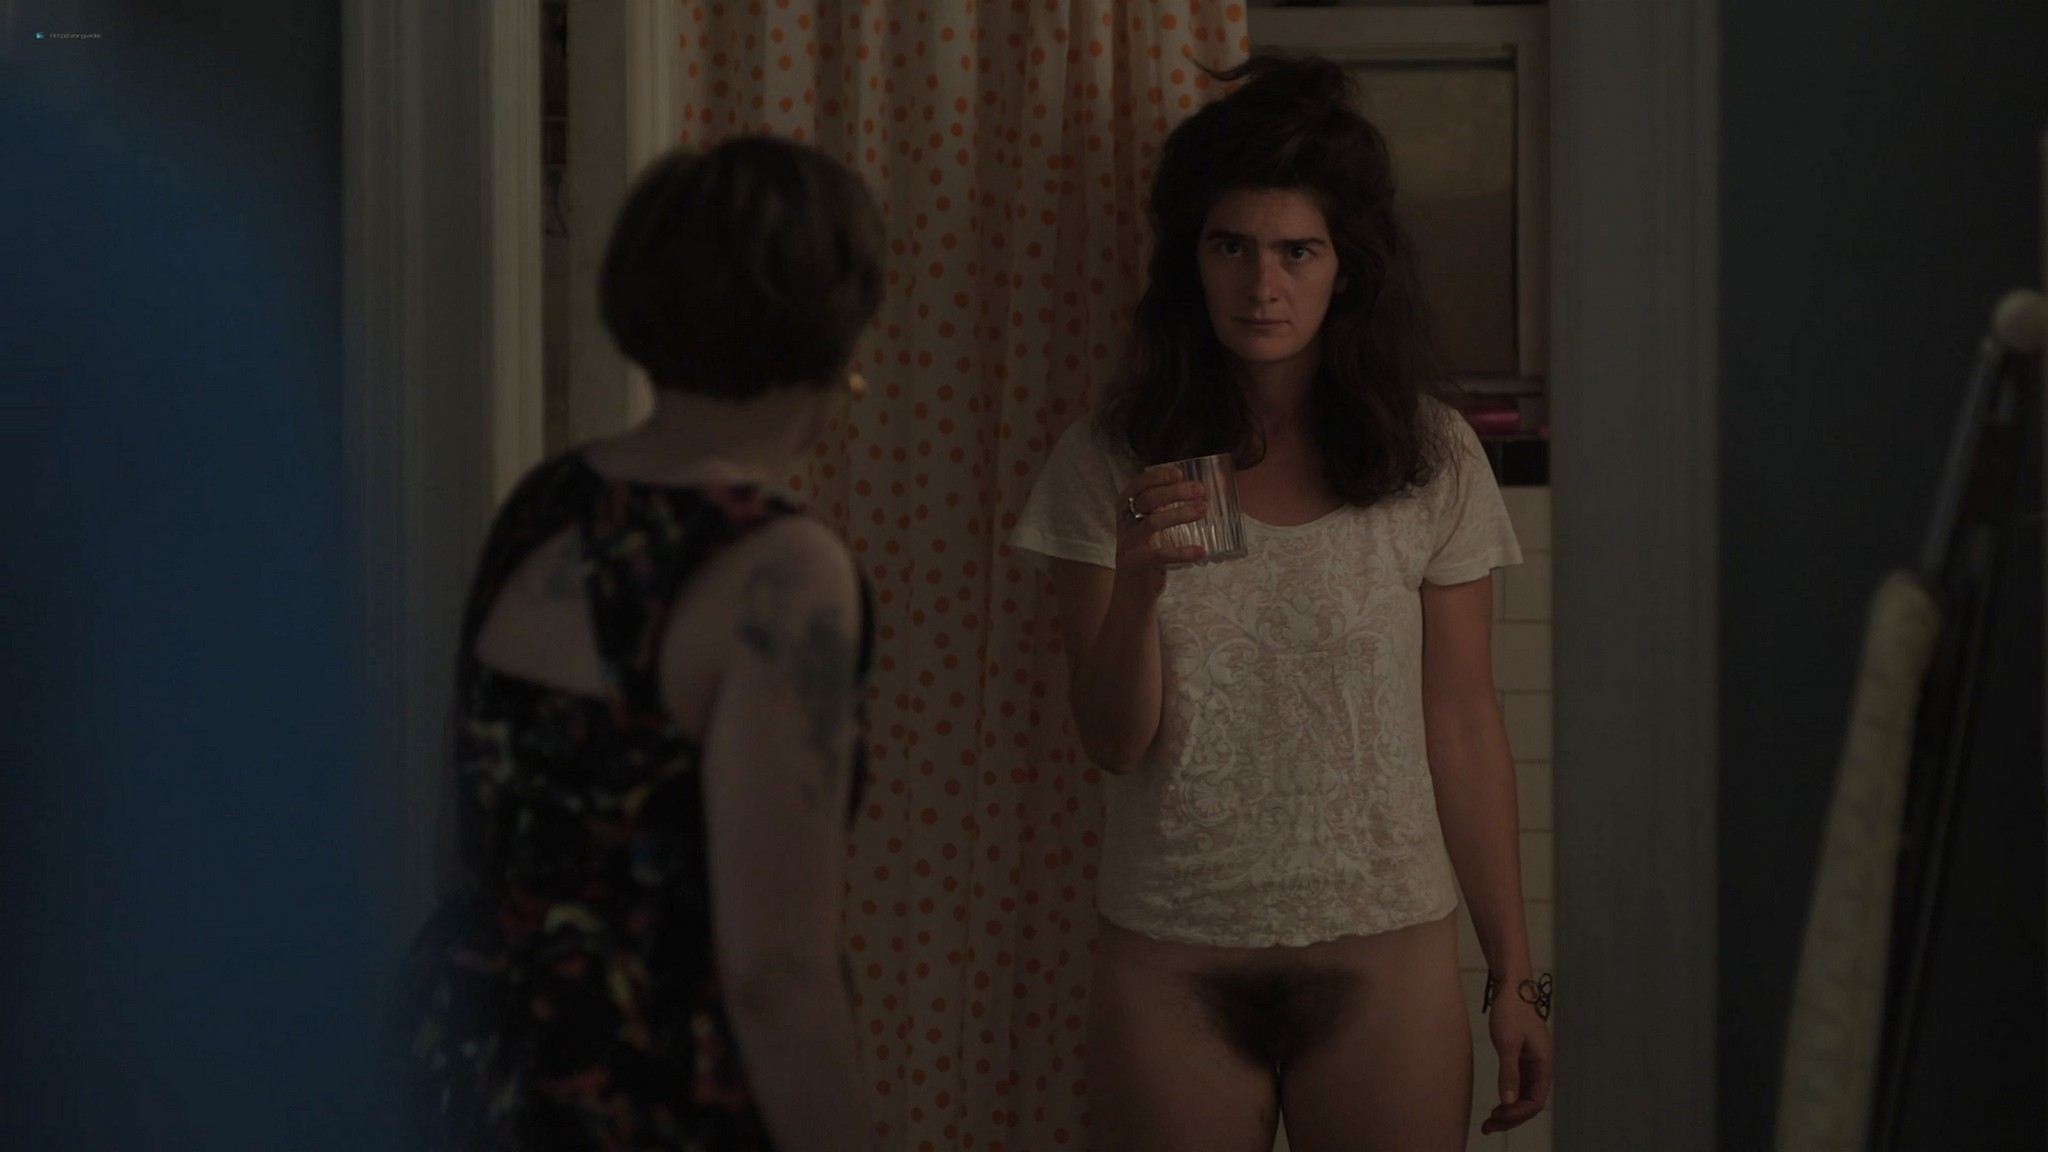 Gaby Hoffmann nude full frontal Allison Williams sex Lena Dunham nude Girls 2012 s3e1 5 1080p Web 7